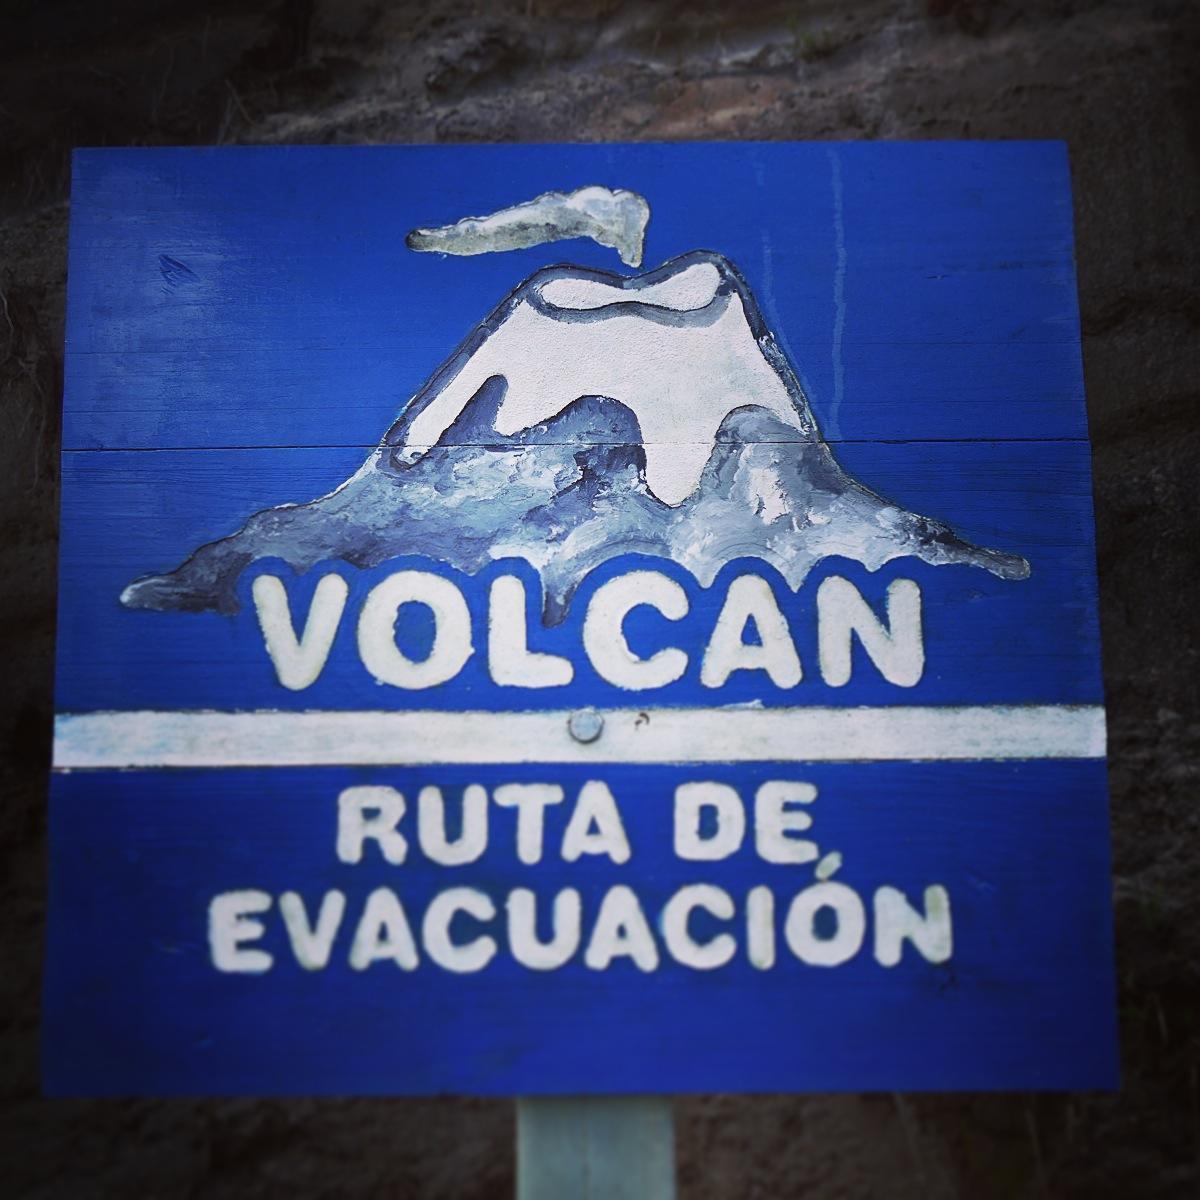 Evacuation route signs are posted along roads near Nevado del Ruiz in Los Nevados National Park. Noah Strycker